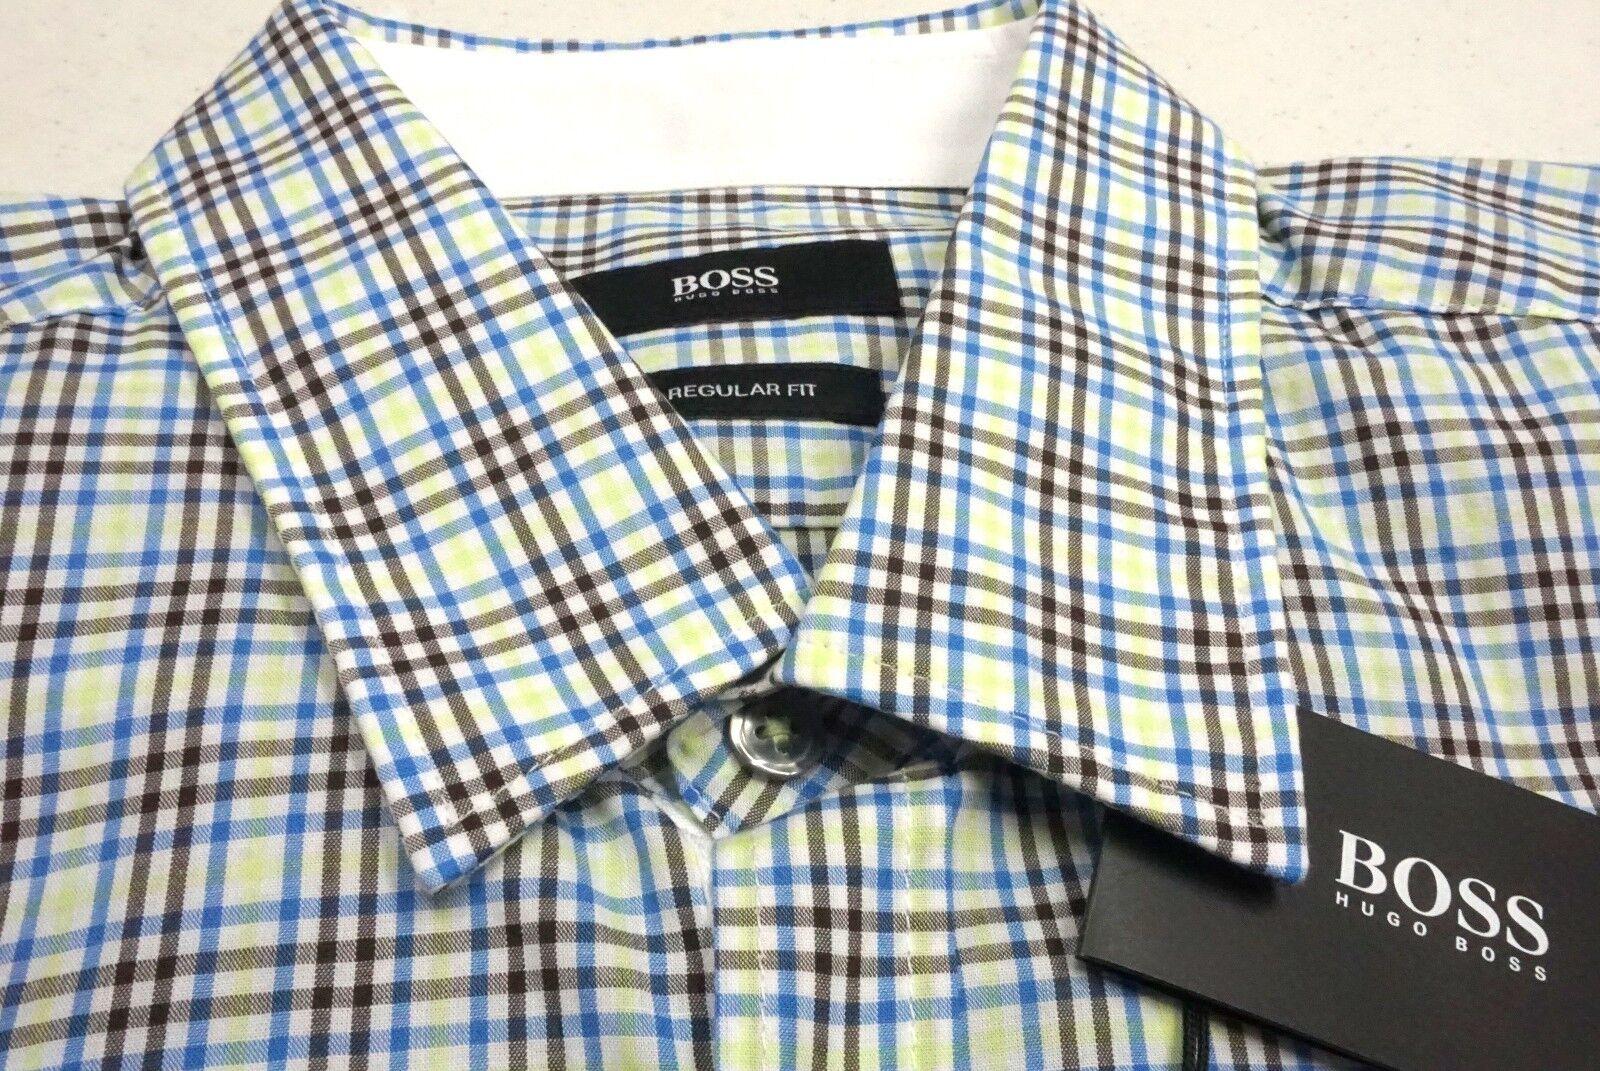 NWT  Hugo Boss SS Shirt Reg Fit bluee Green Brown Plaid Mens Size L M 2XL NEW